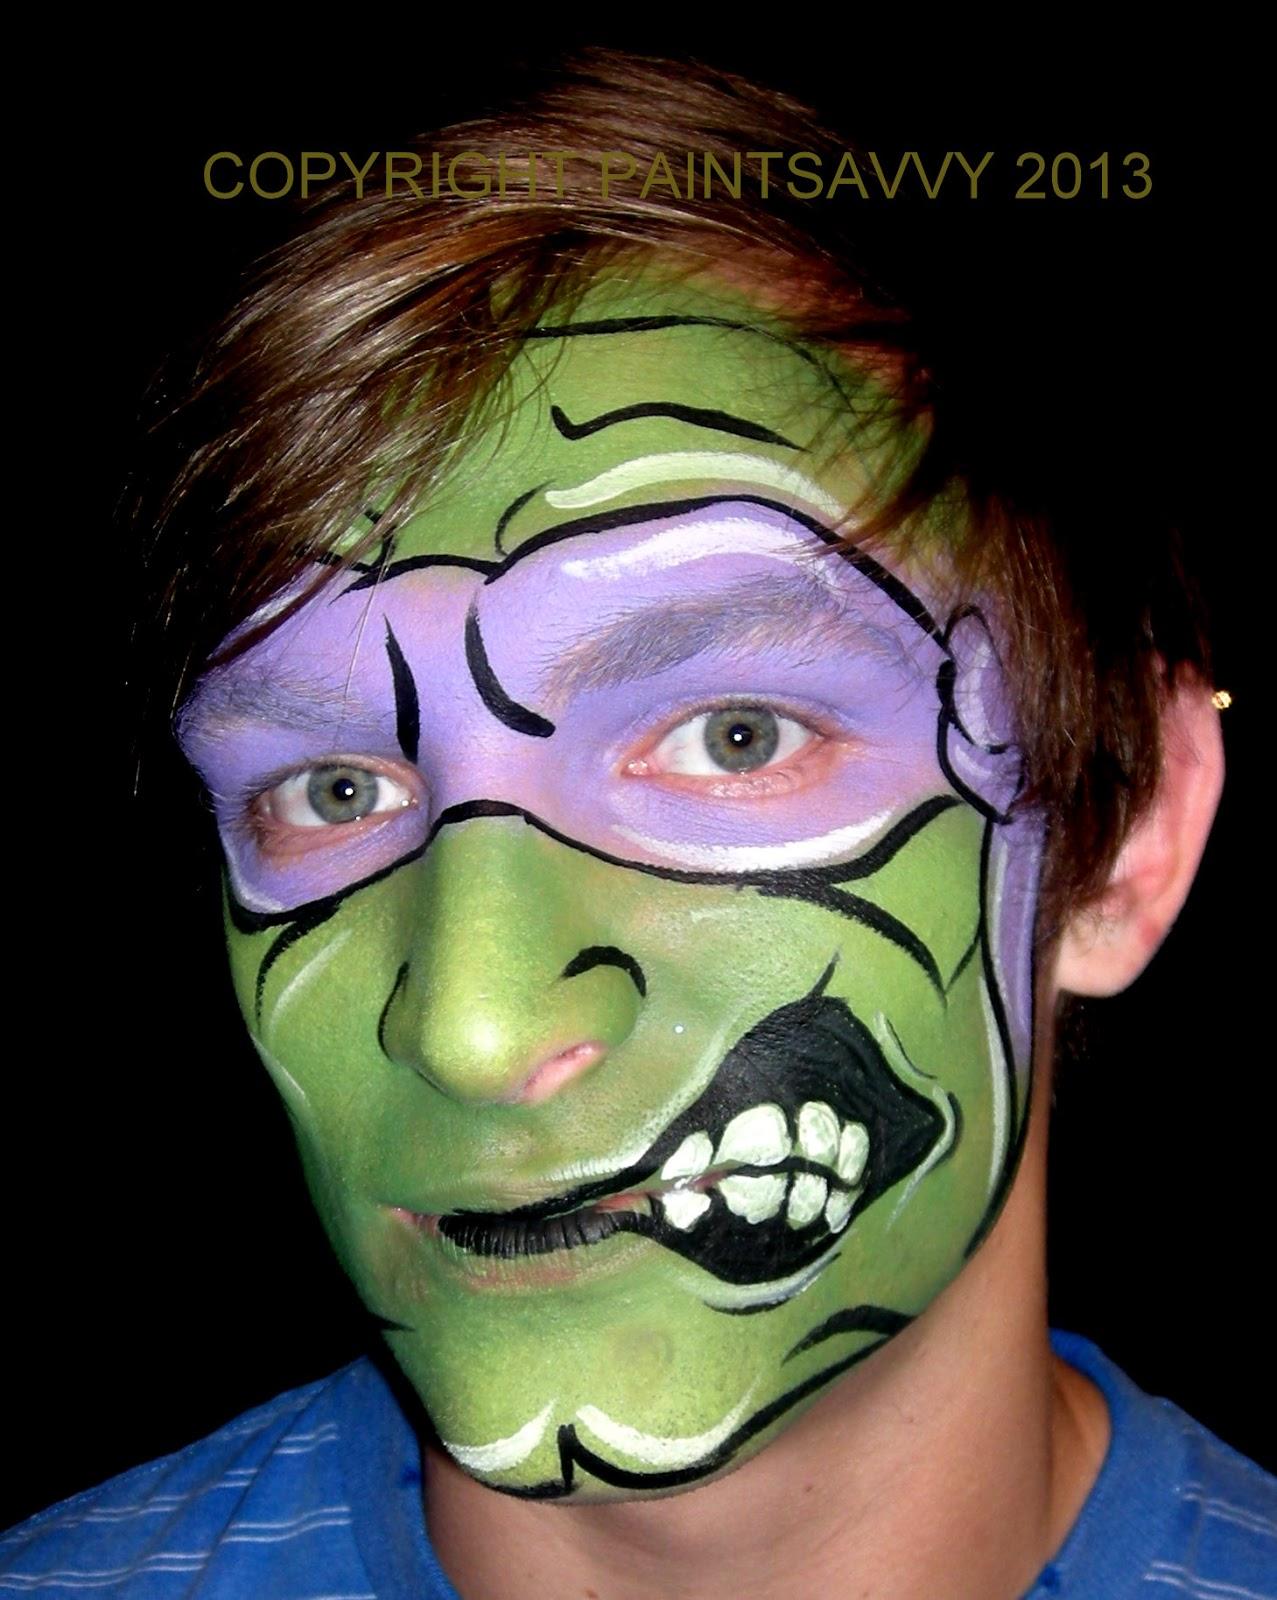 Teenage Mutant Ninja Turtle Party | Paint Savvy parties ...